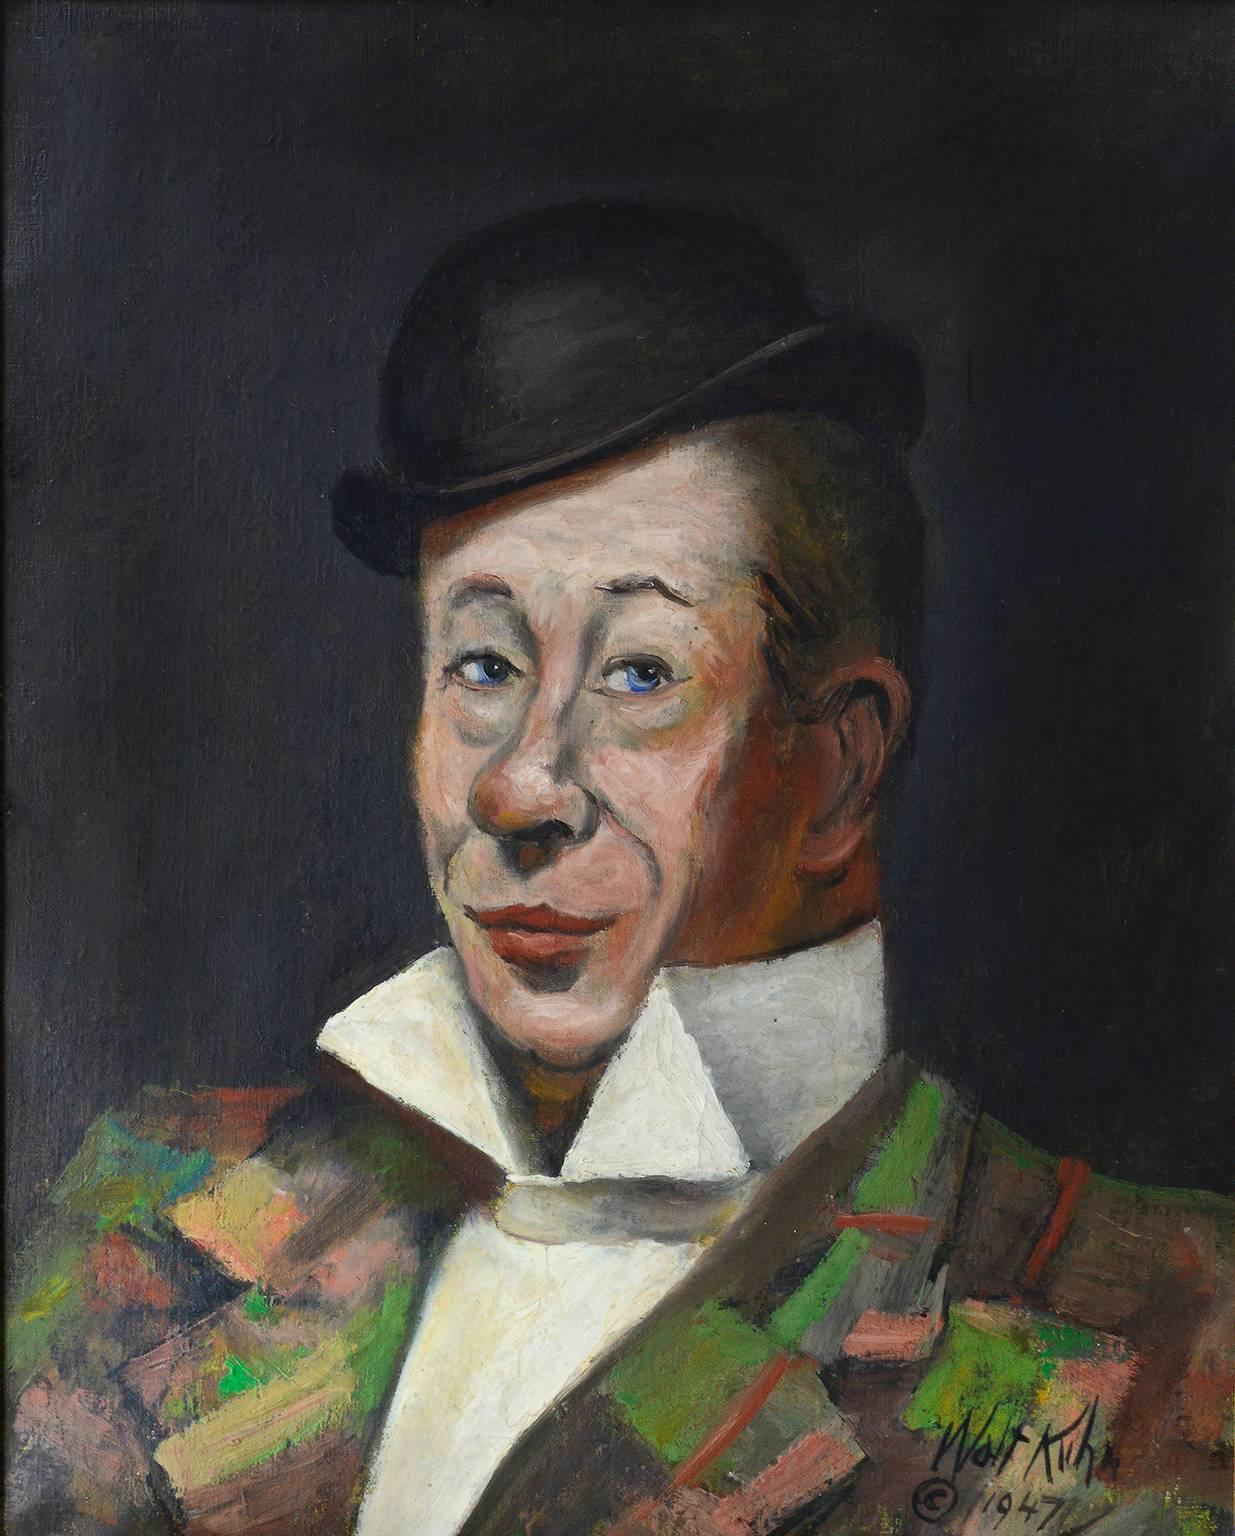 Portrait of Bert Lahr